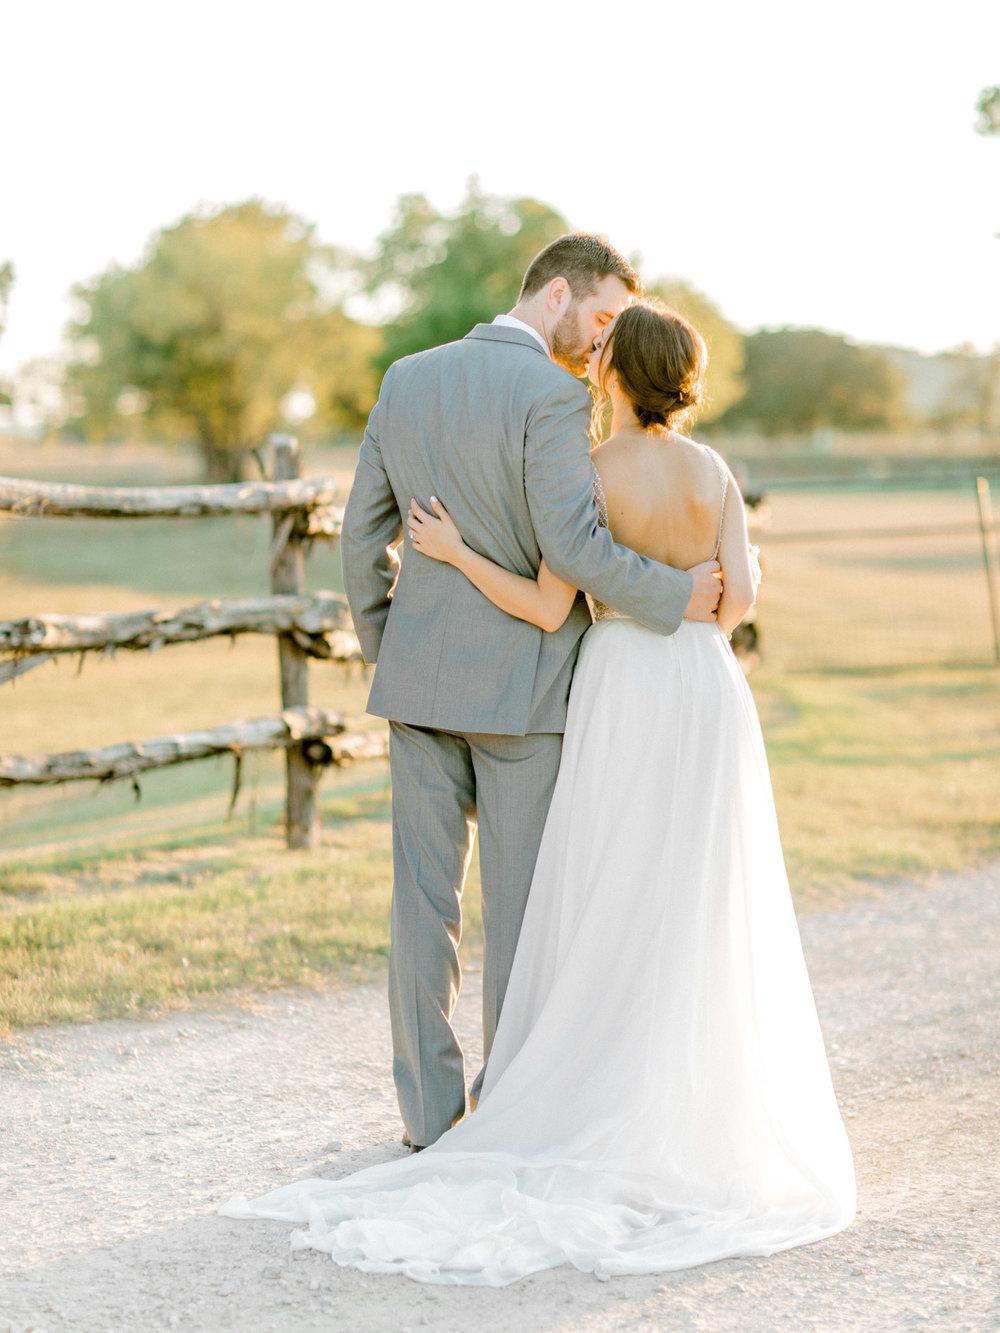 honey-hollow-ranch-wedding-32.jpg